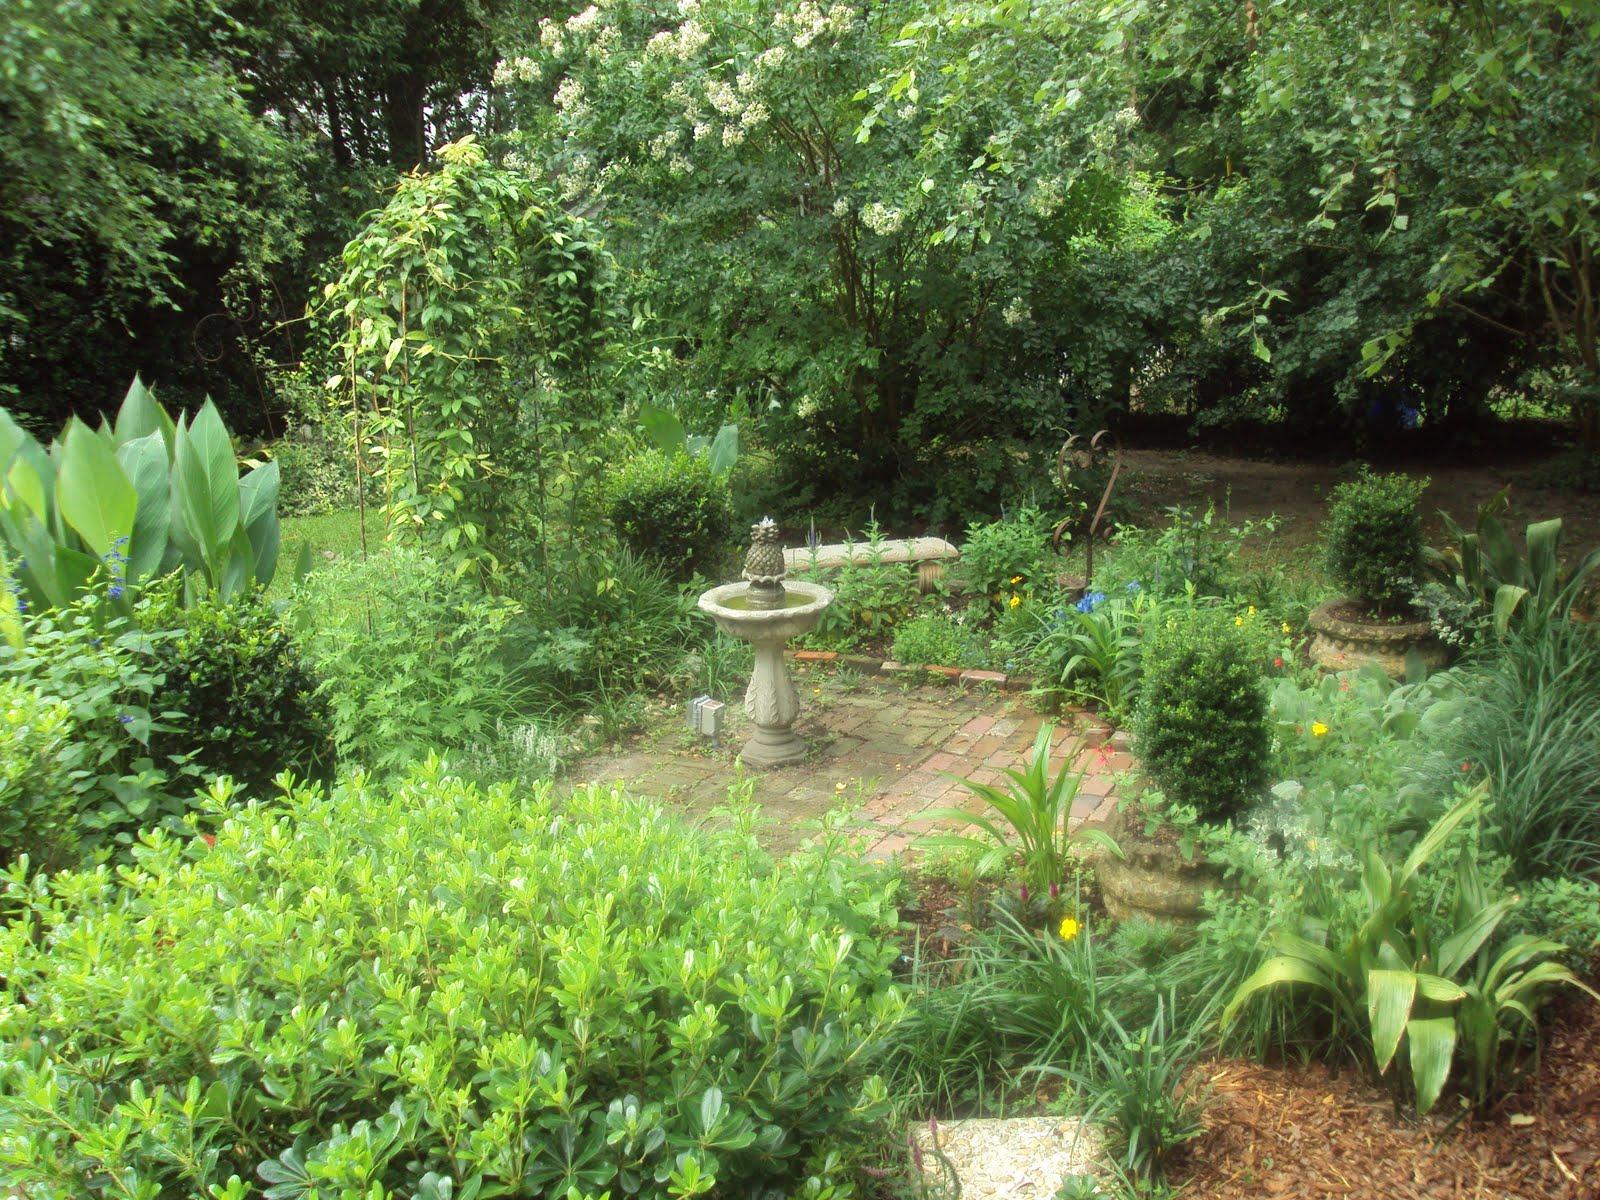 antique art garden: i got my garden feelings hurt.